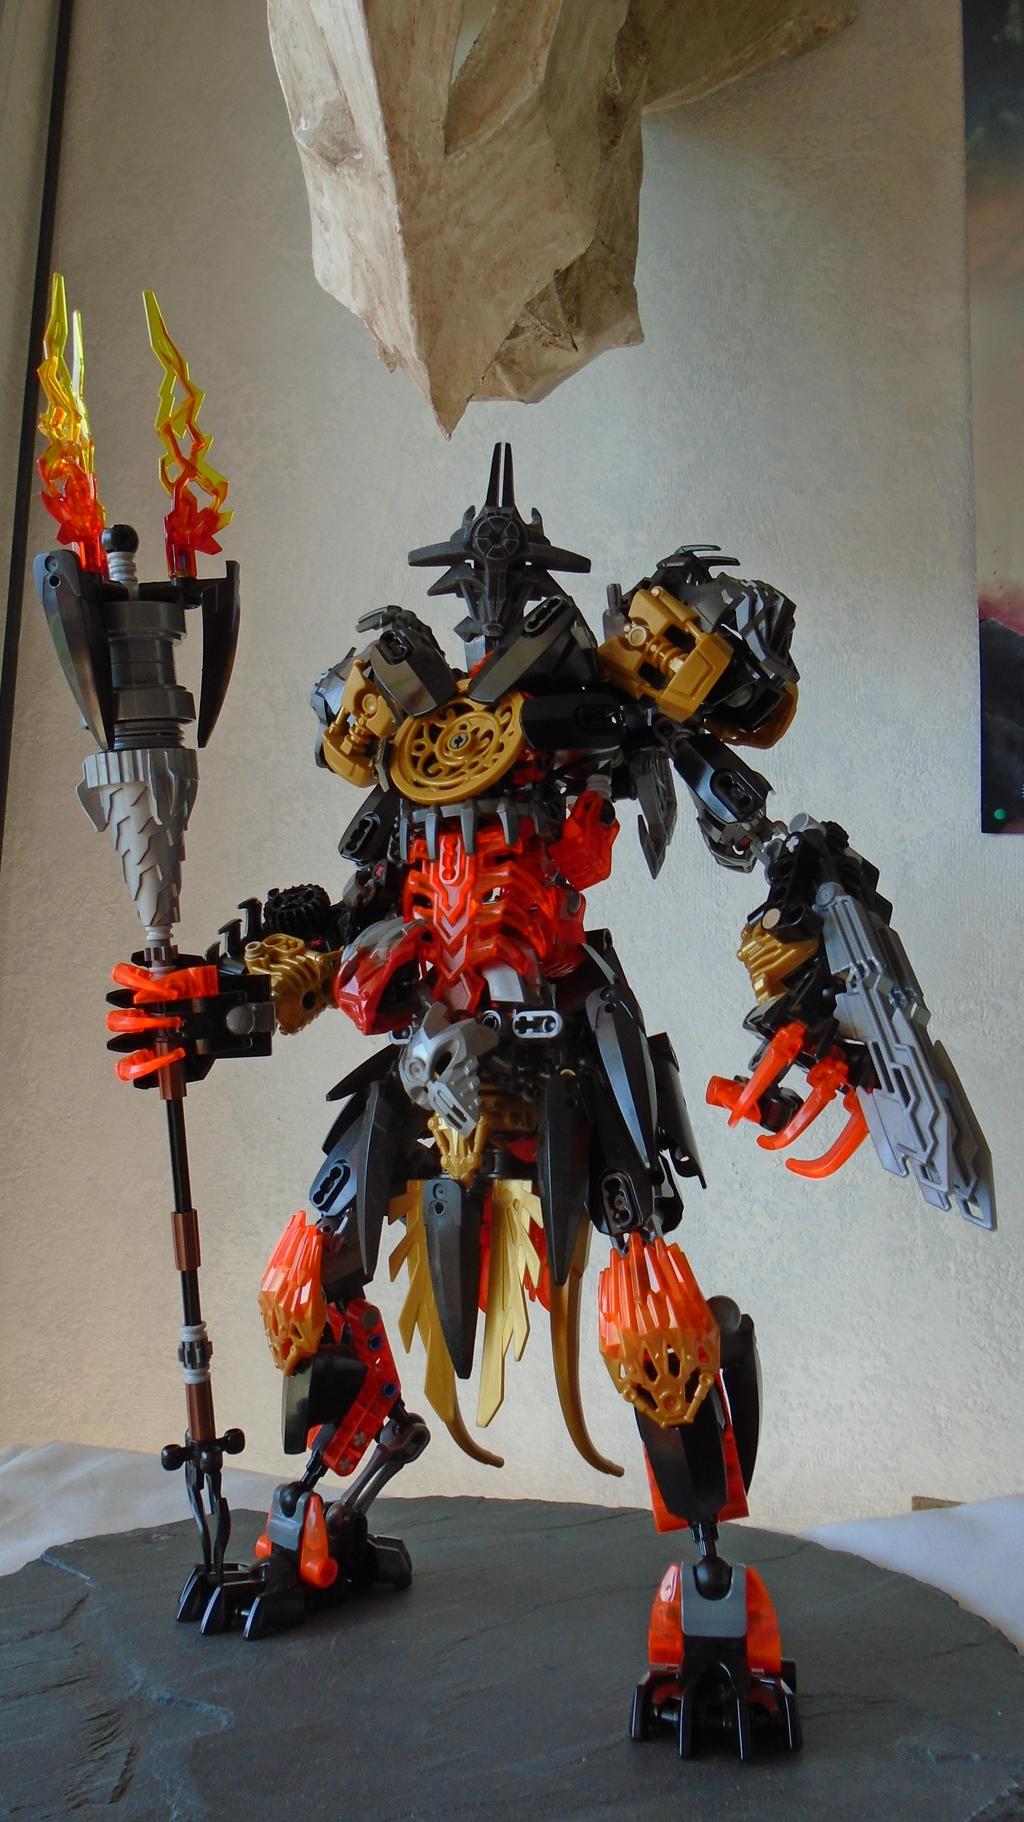 Лего Биониклы (Bionicle) - каталог наборов с инструкциями 35